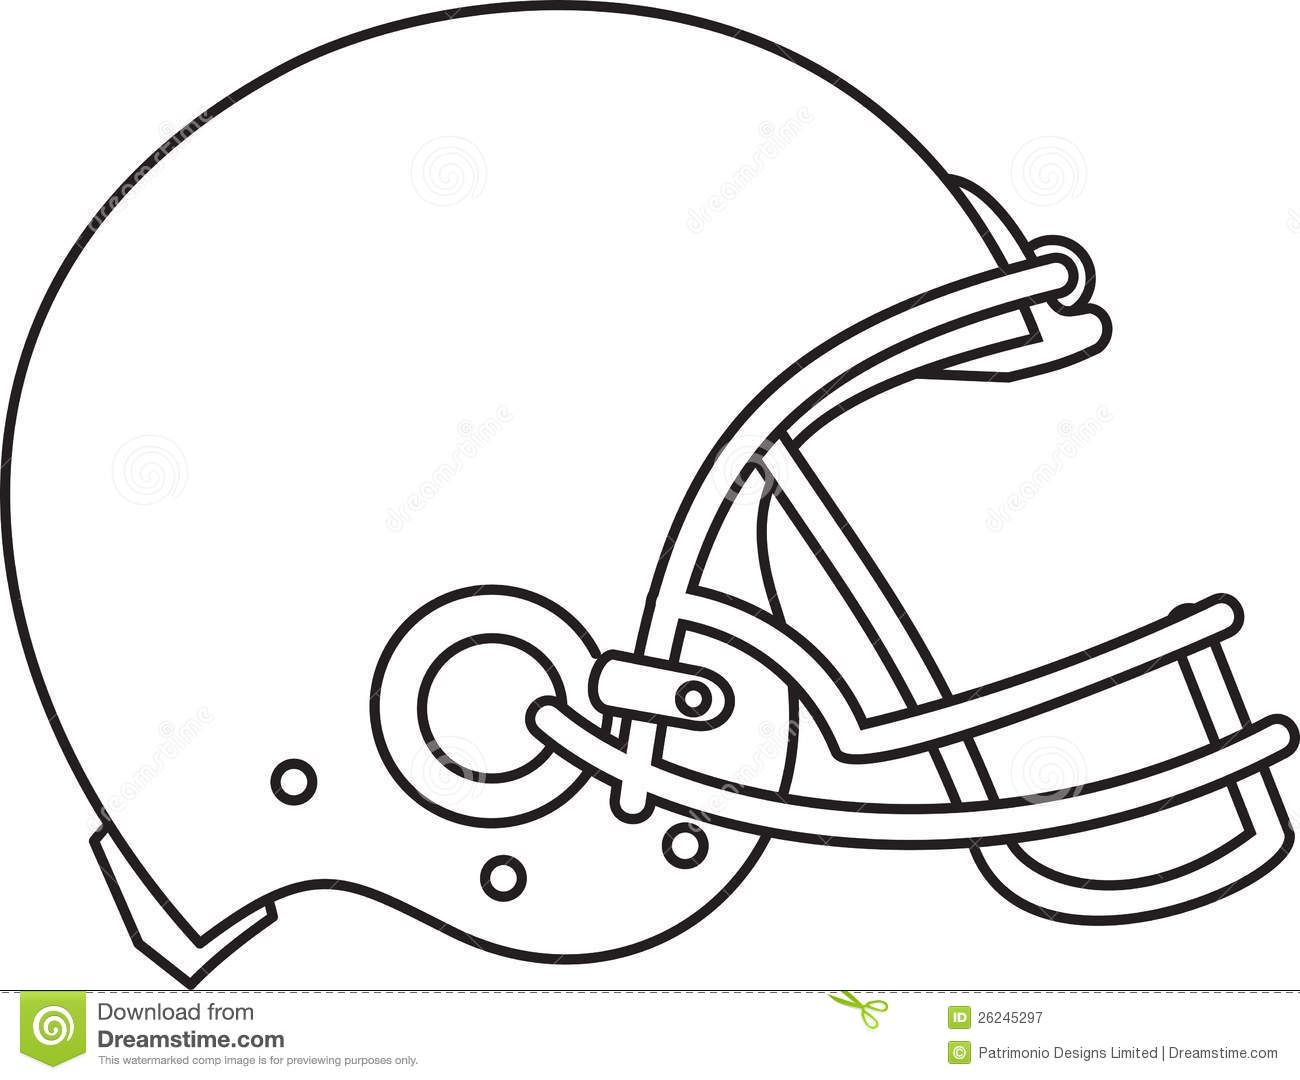 Vbs 2018 Game On Helmet Of Salvation Football Helmets Football Drawing Line Drawing